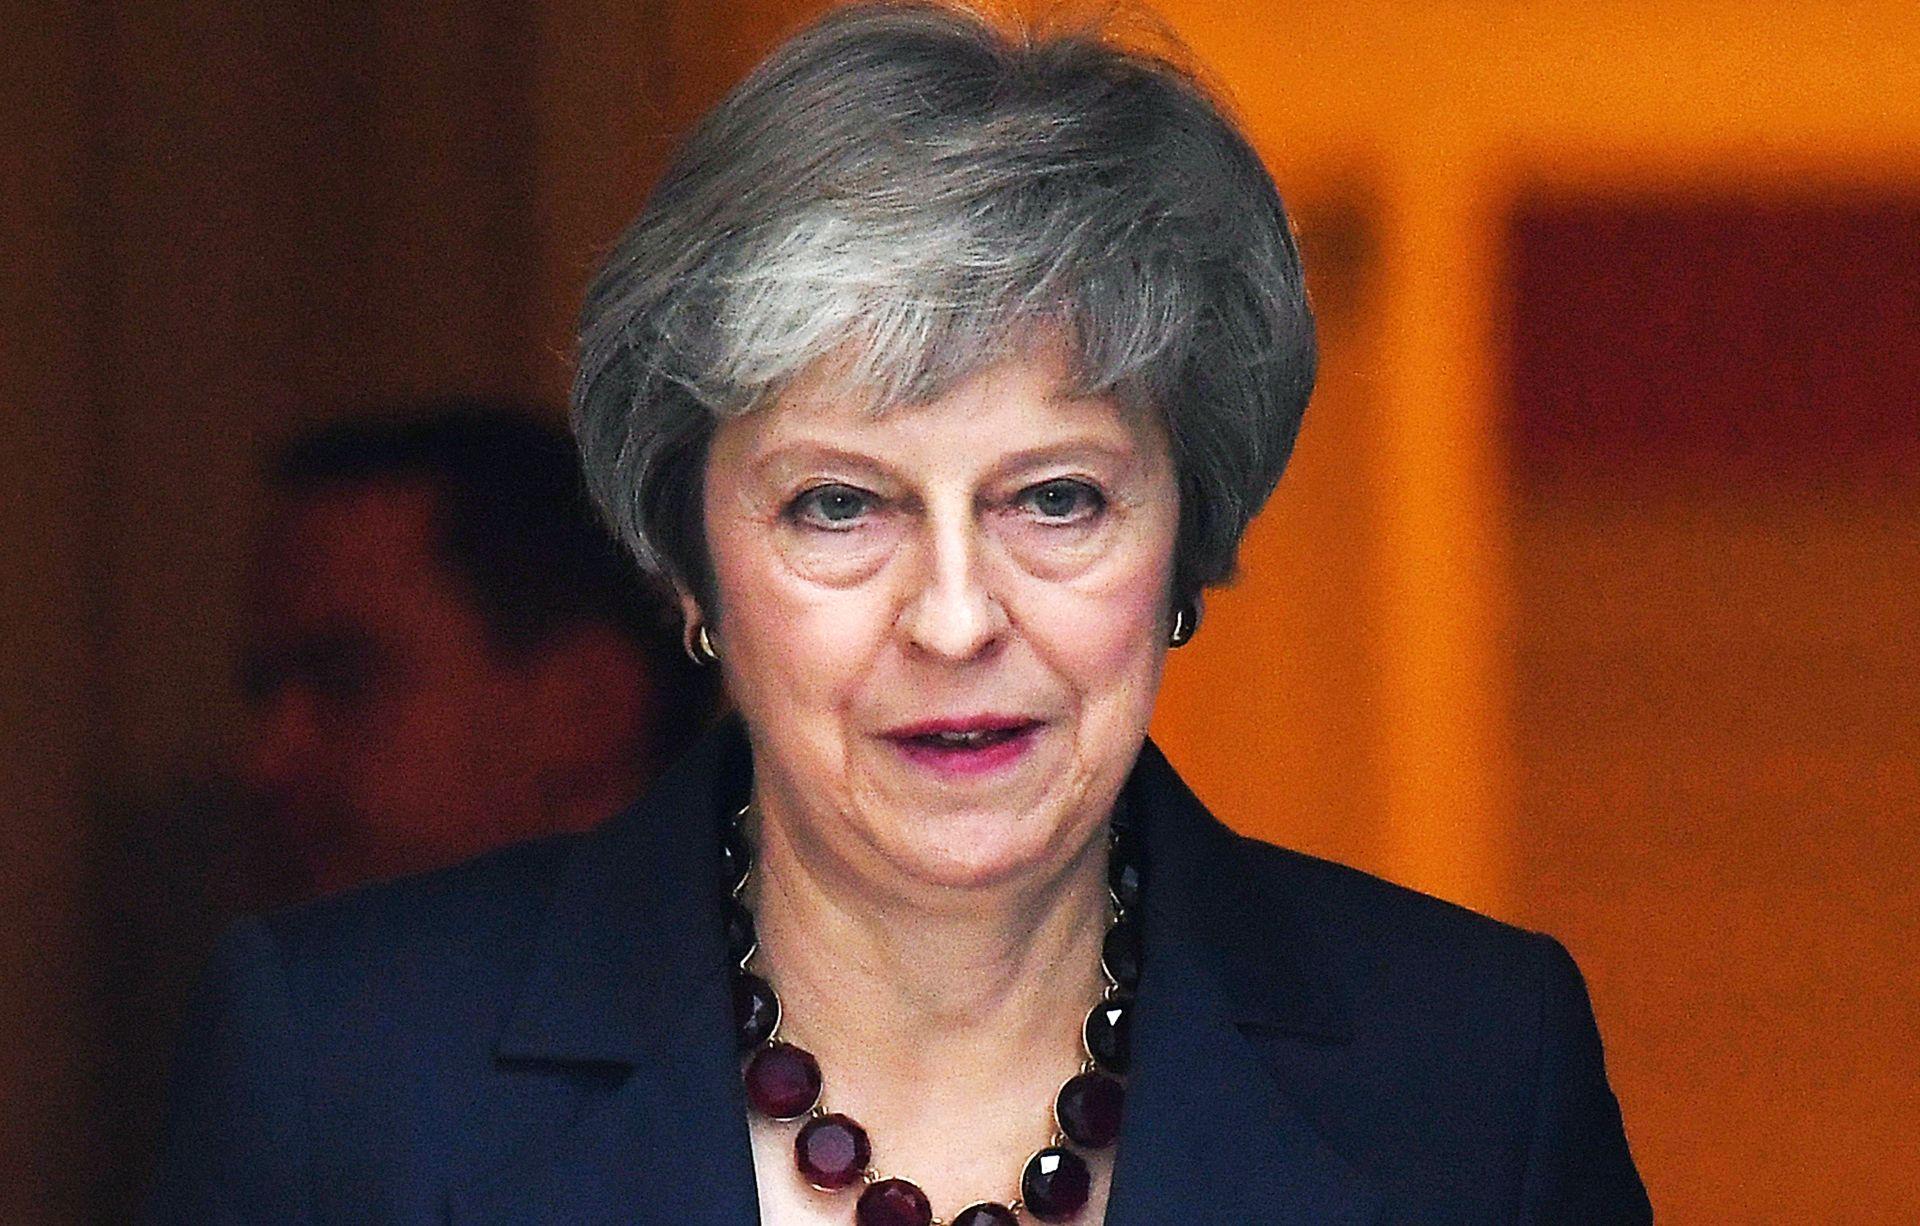 May stala u obranu svog sporazuma o Brexitu